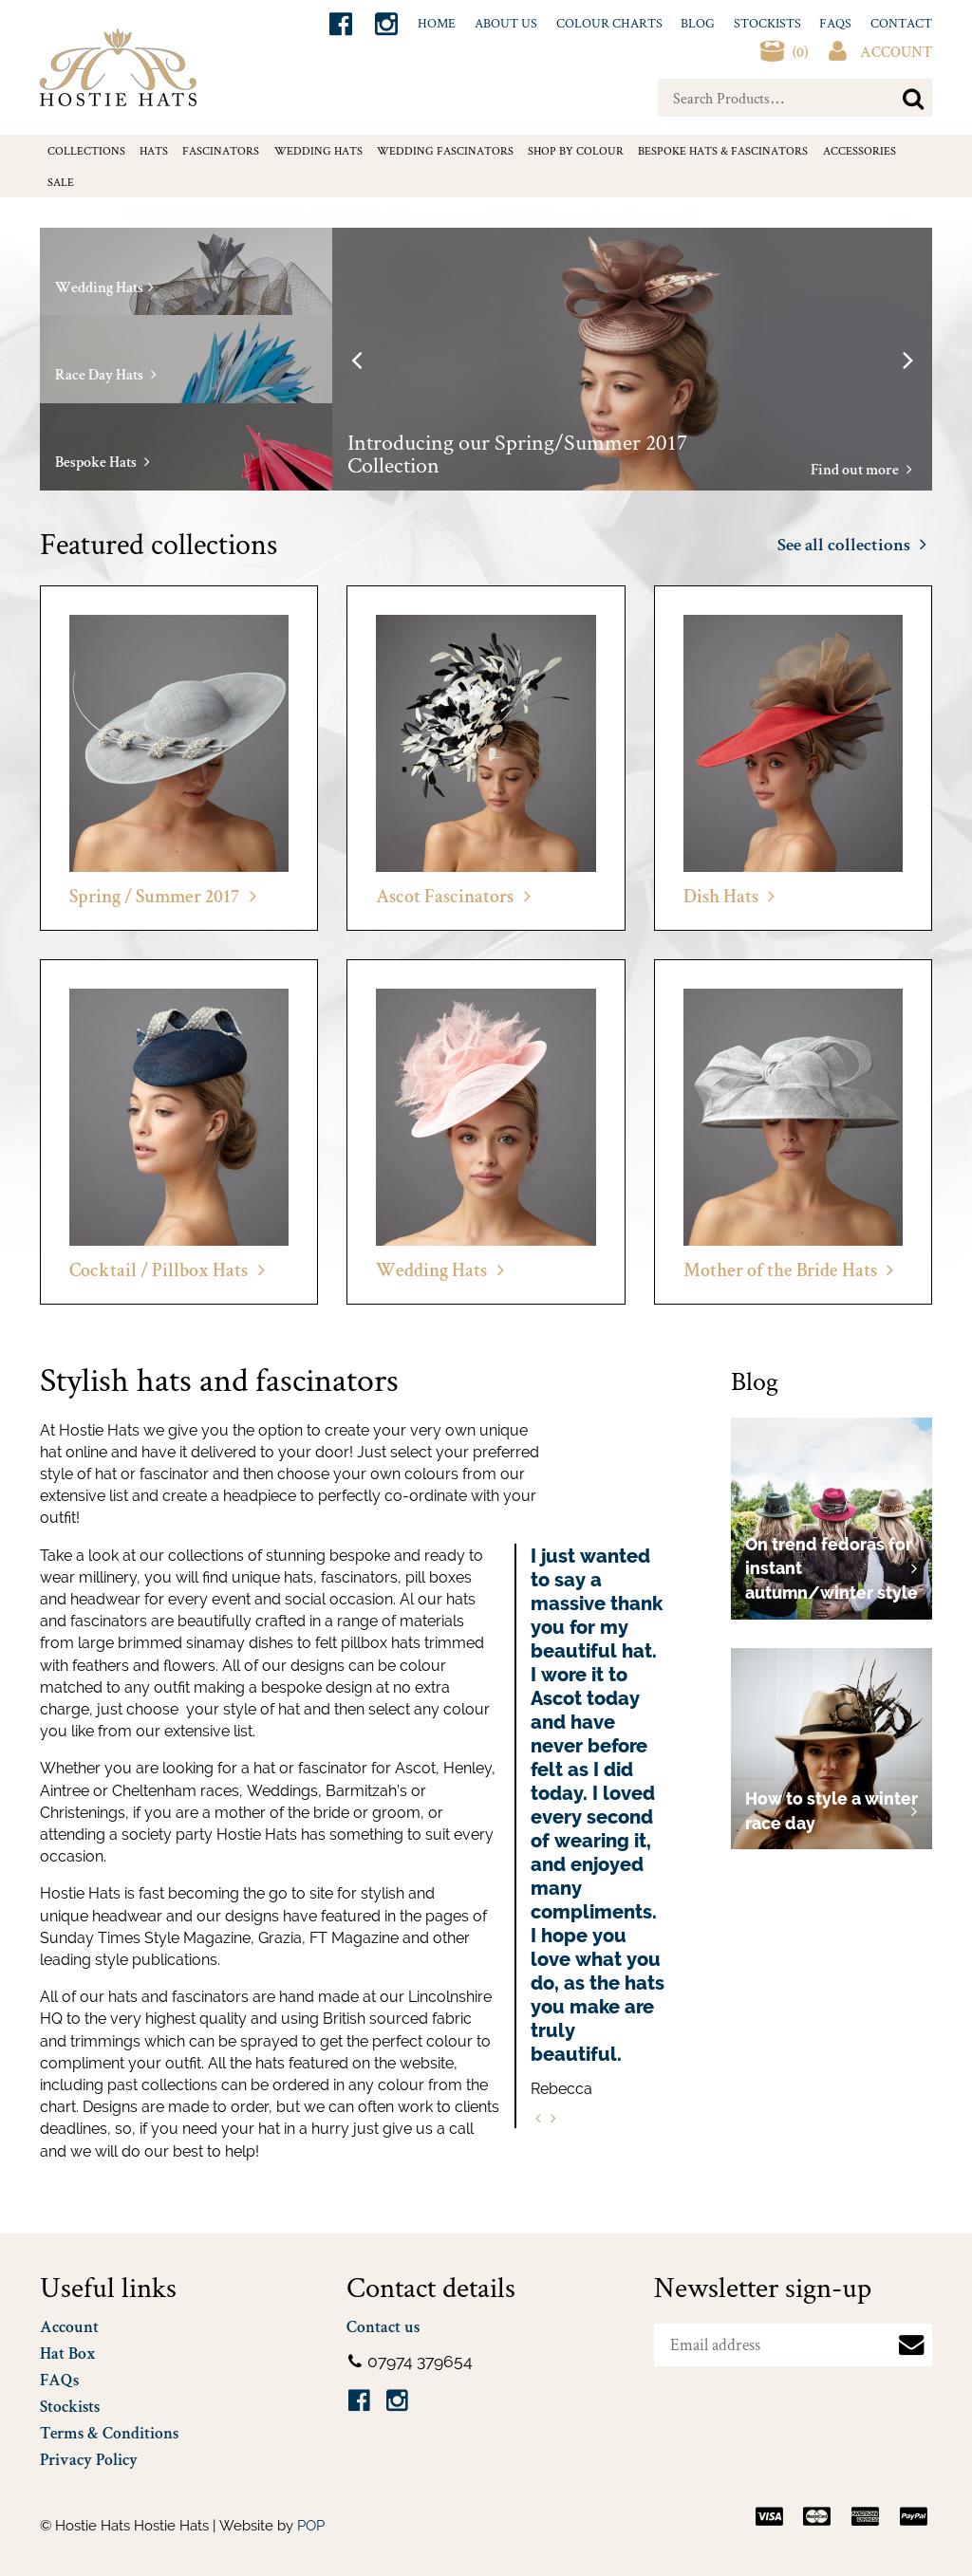 dde01a4e Hostie Hats Competitors, Revenue and Employees - Owler Company Profile